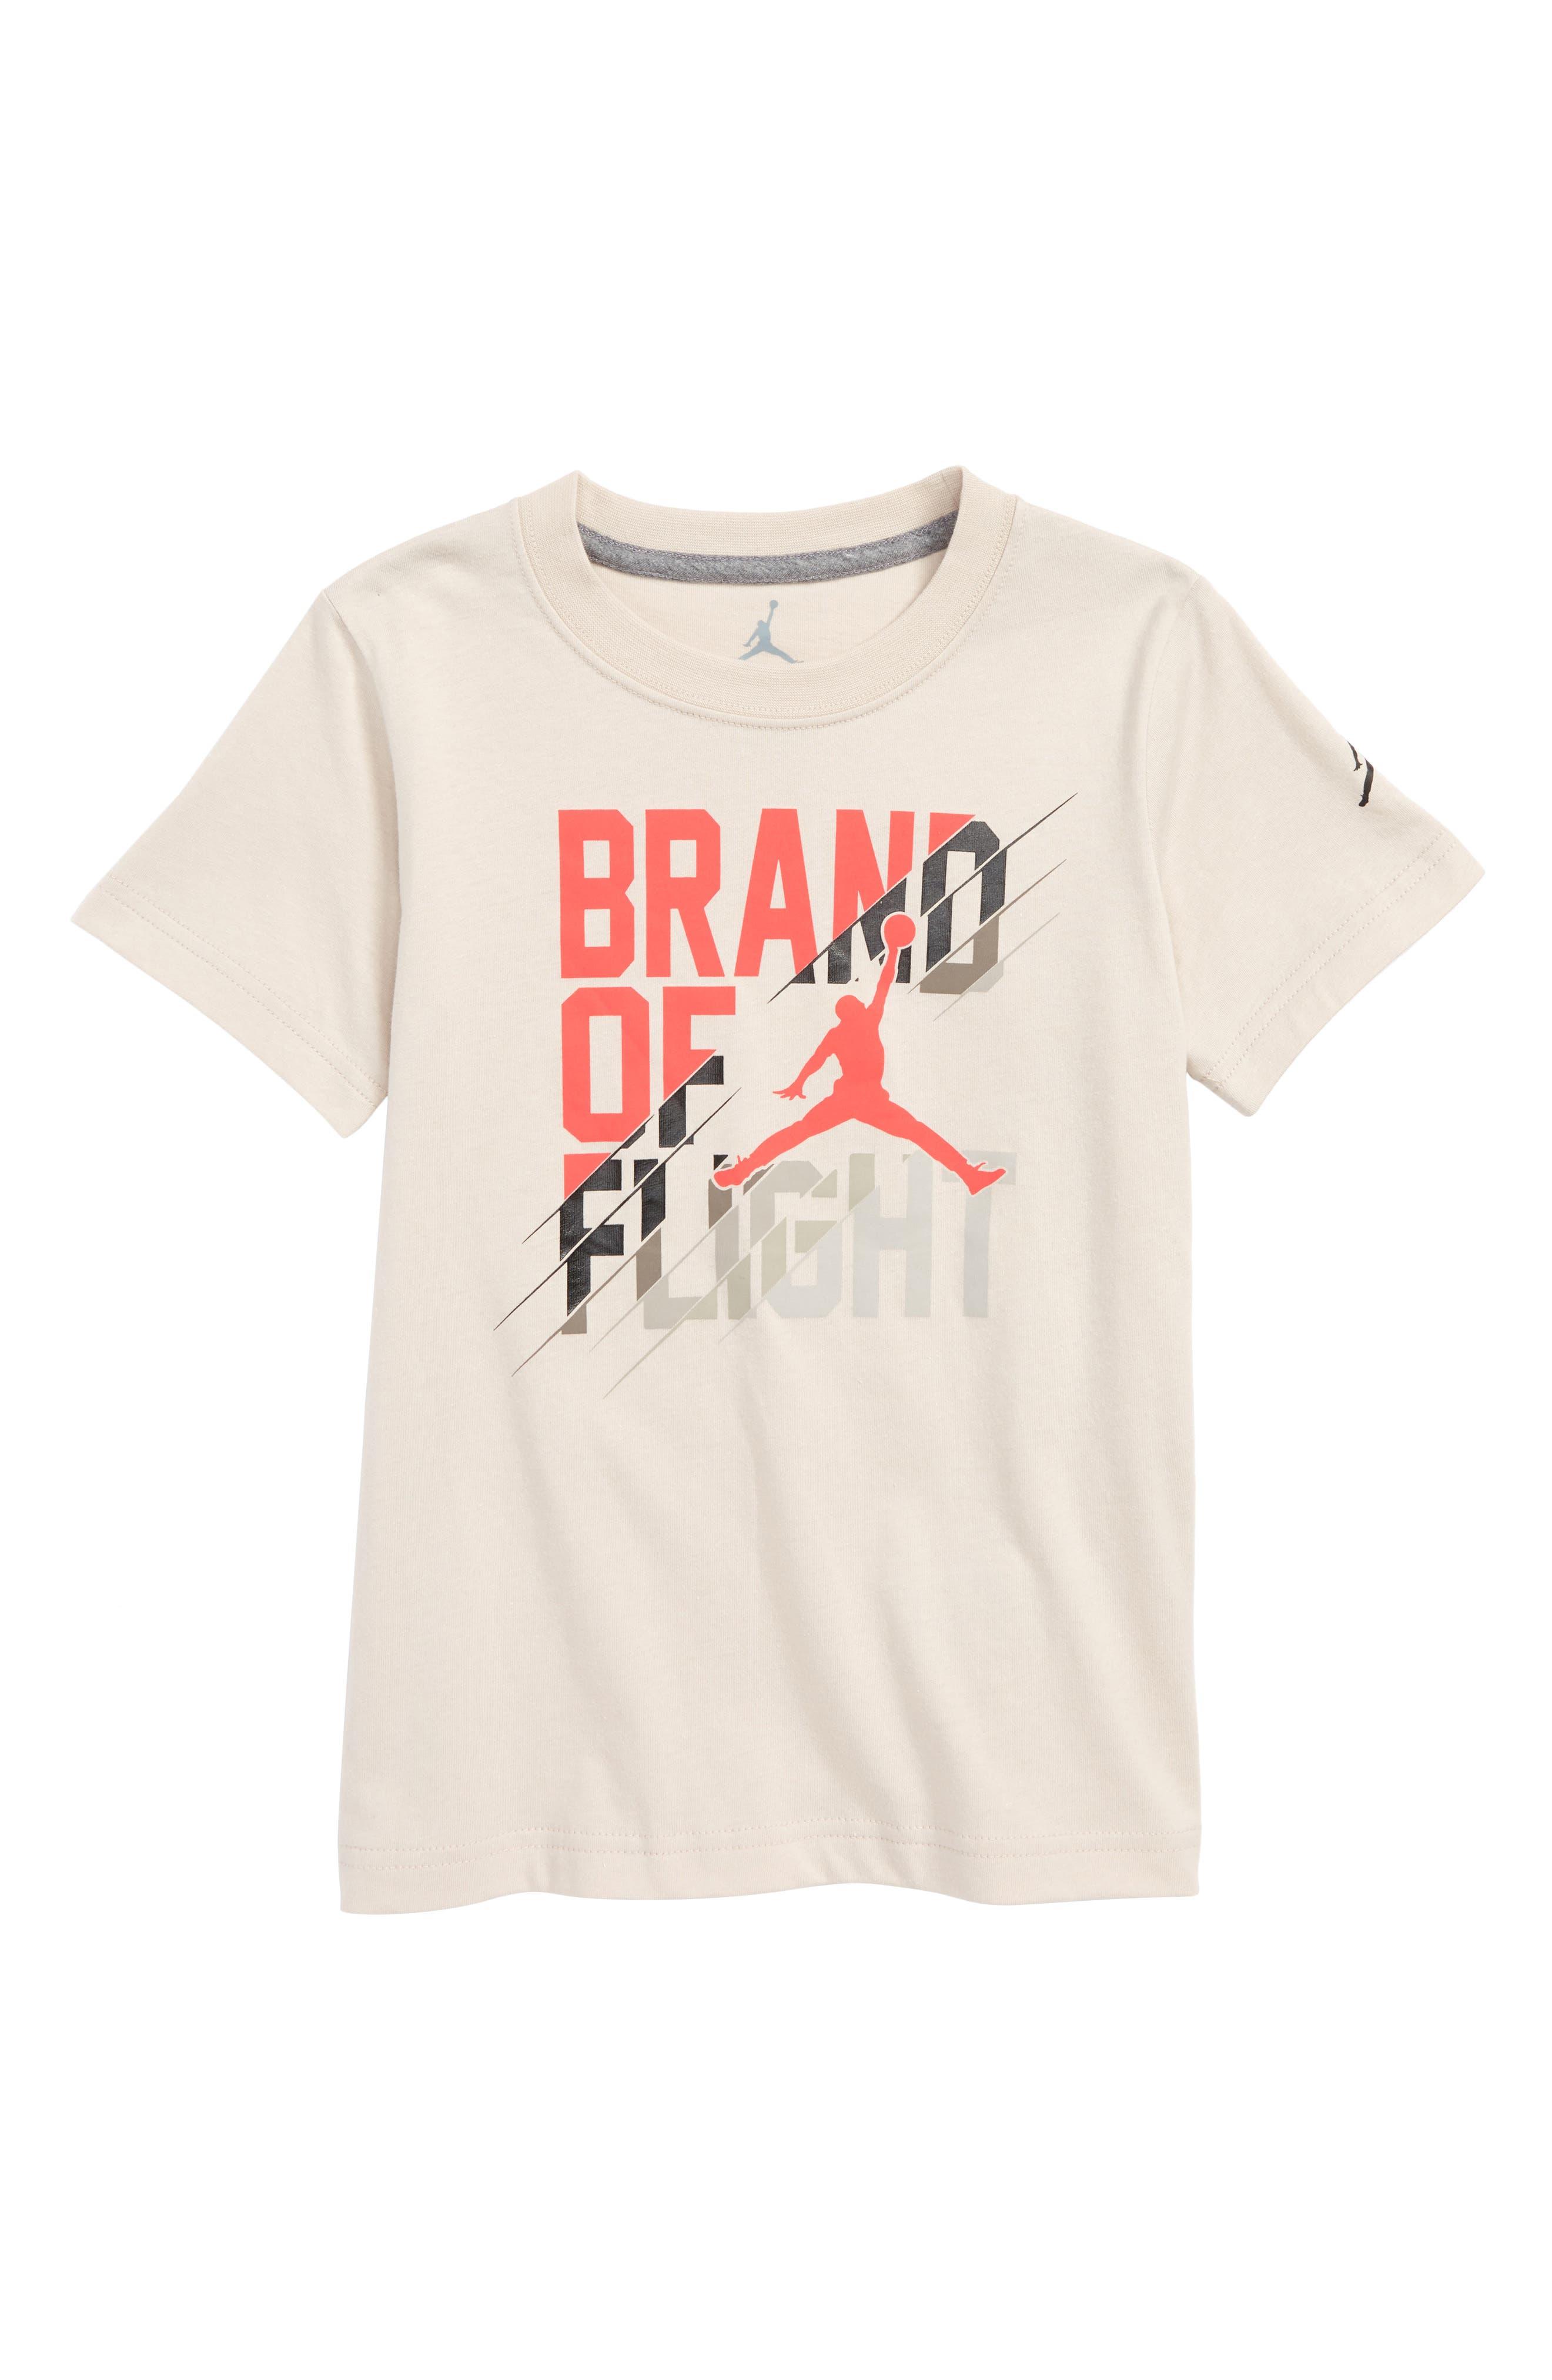 Jordan Cut to the Rim T-Shirt,                             Main thumbnail 1, color,                             Desert Sand